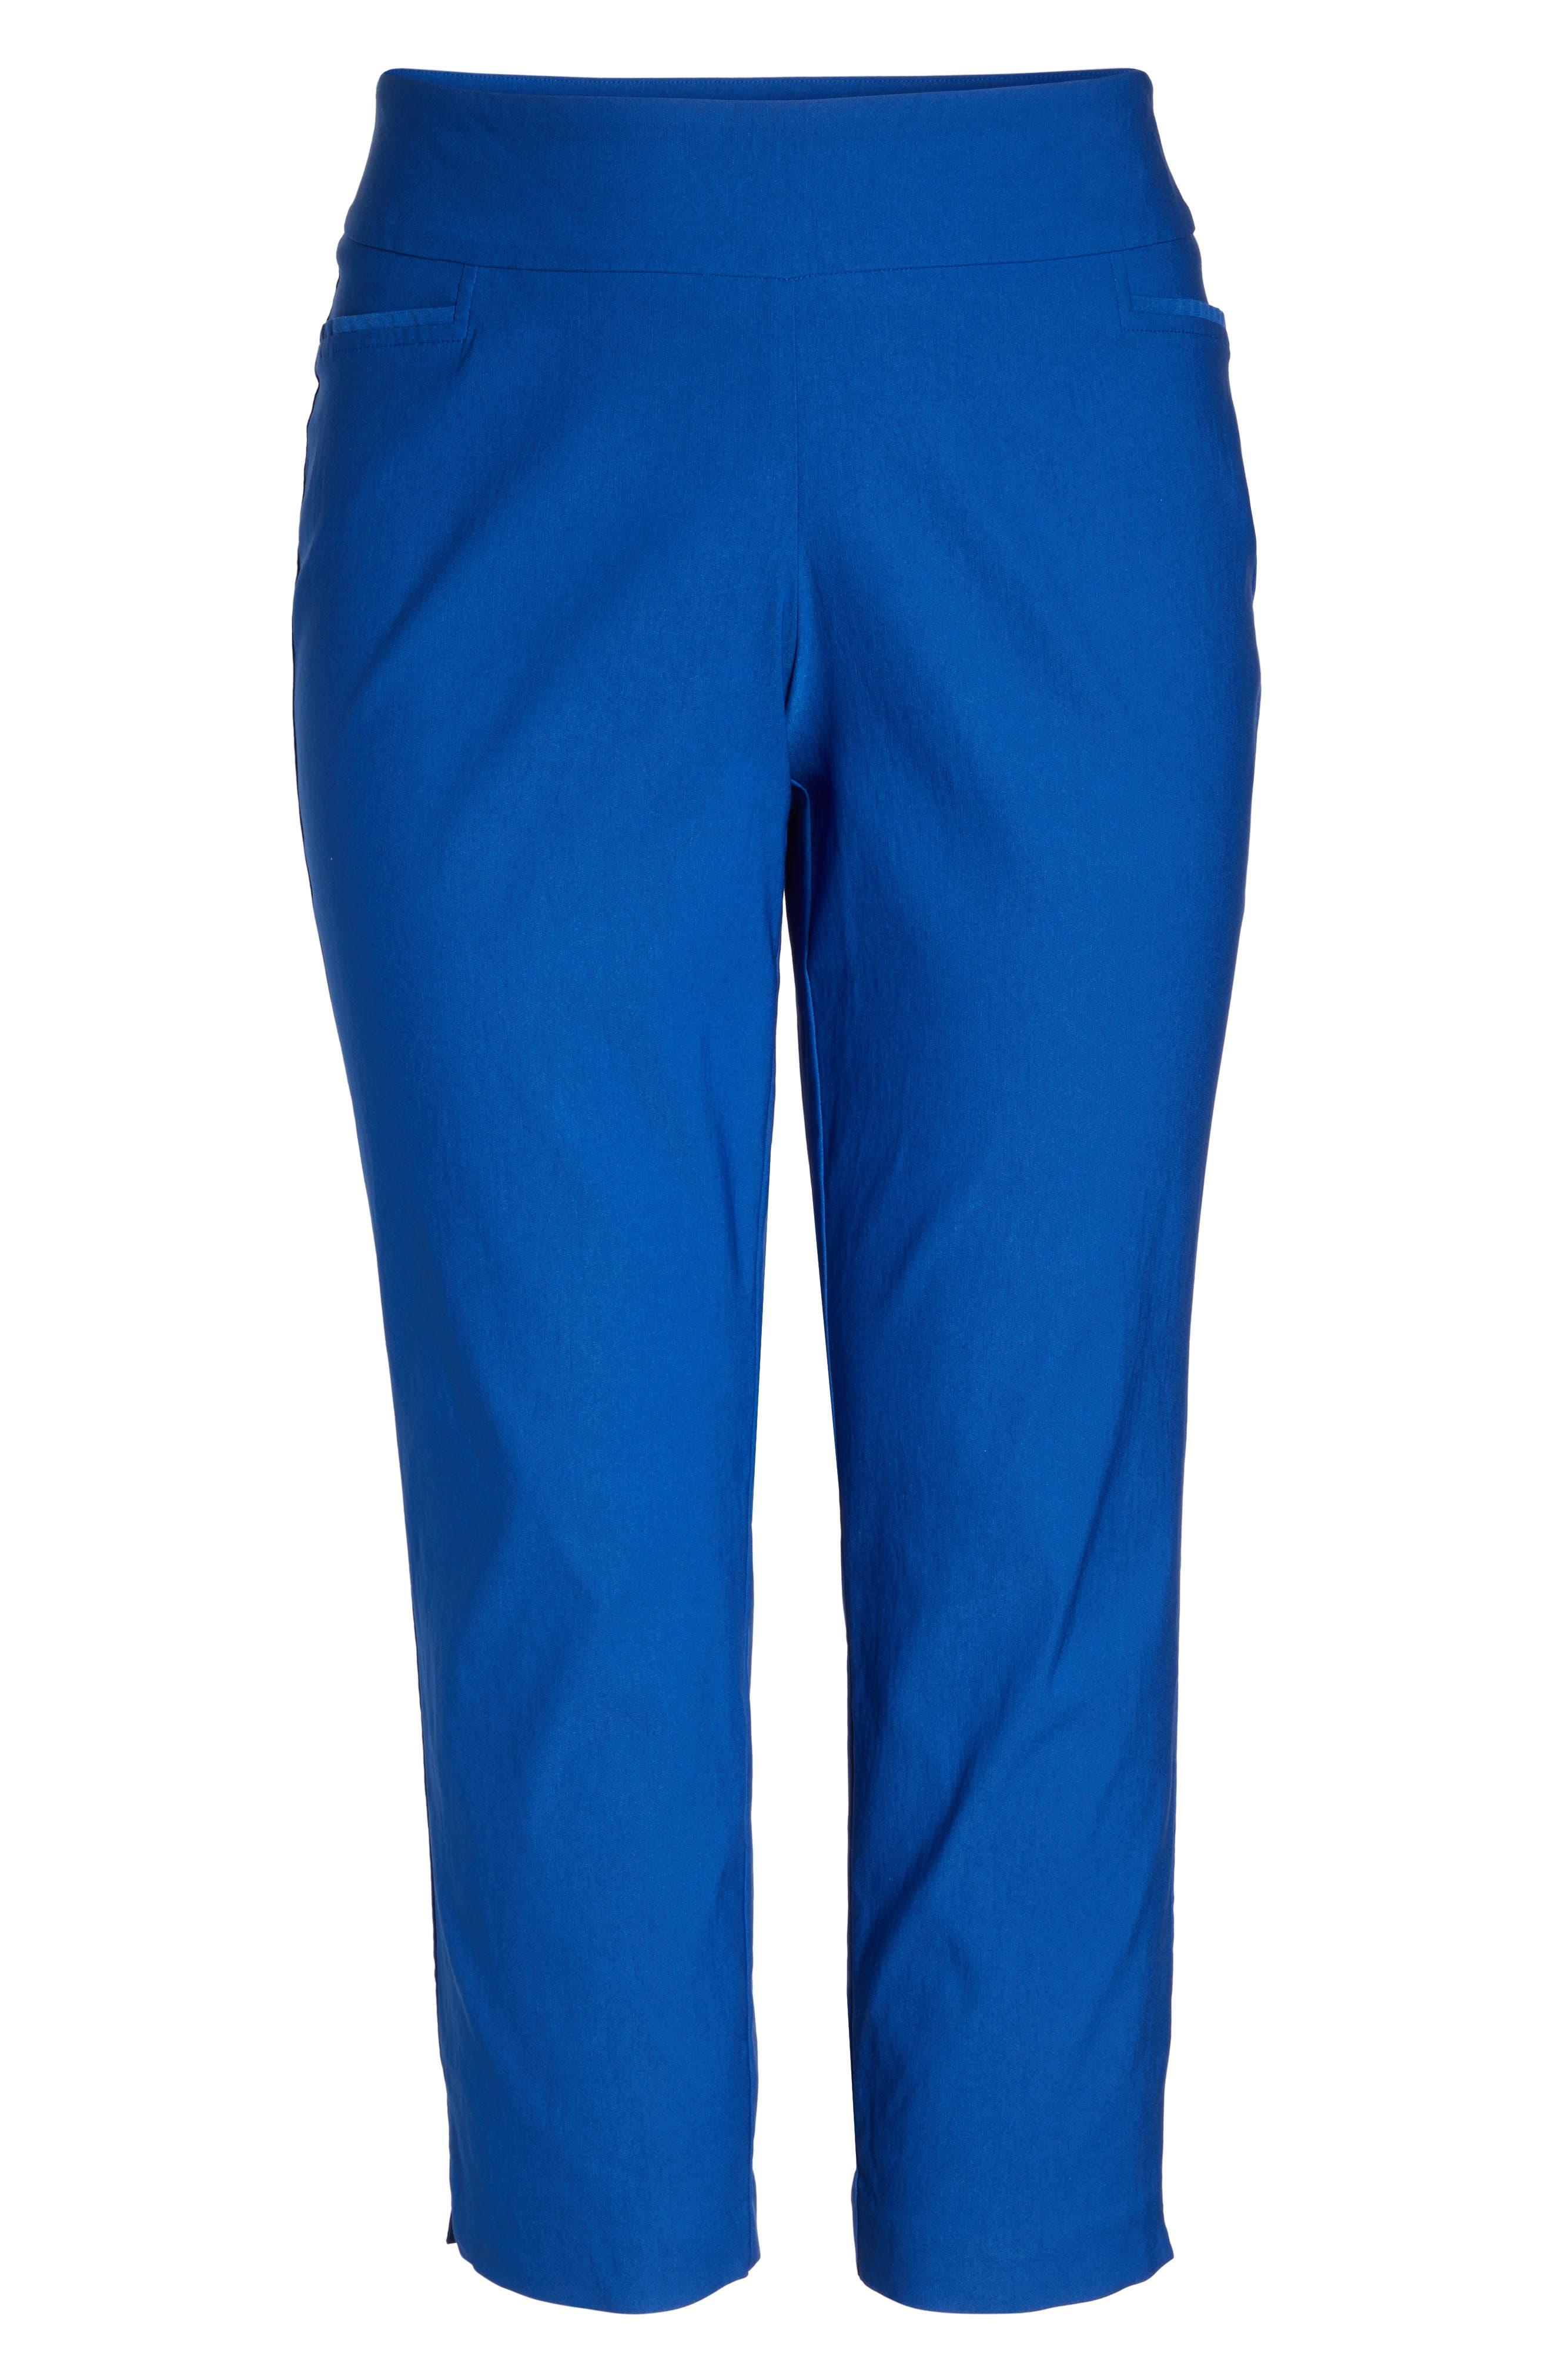 Stretch Ankle Pants,                             Alternate thumbnail 6, color,                             Blue Mazarine